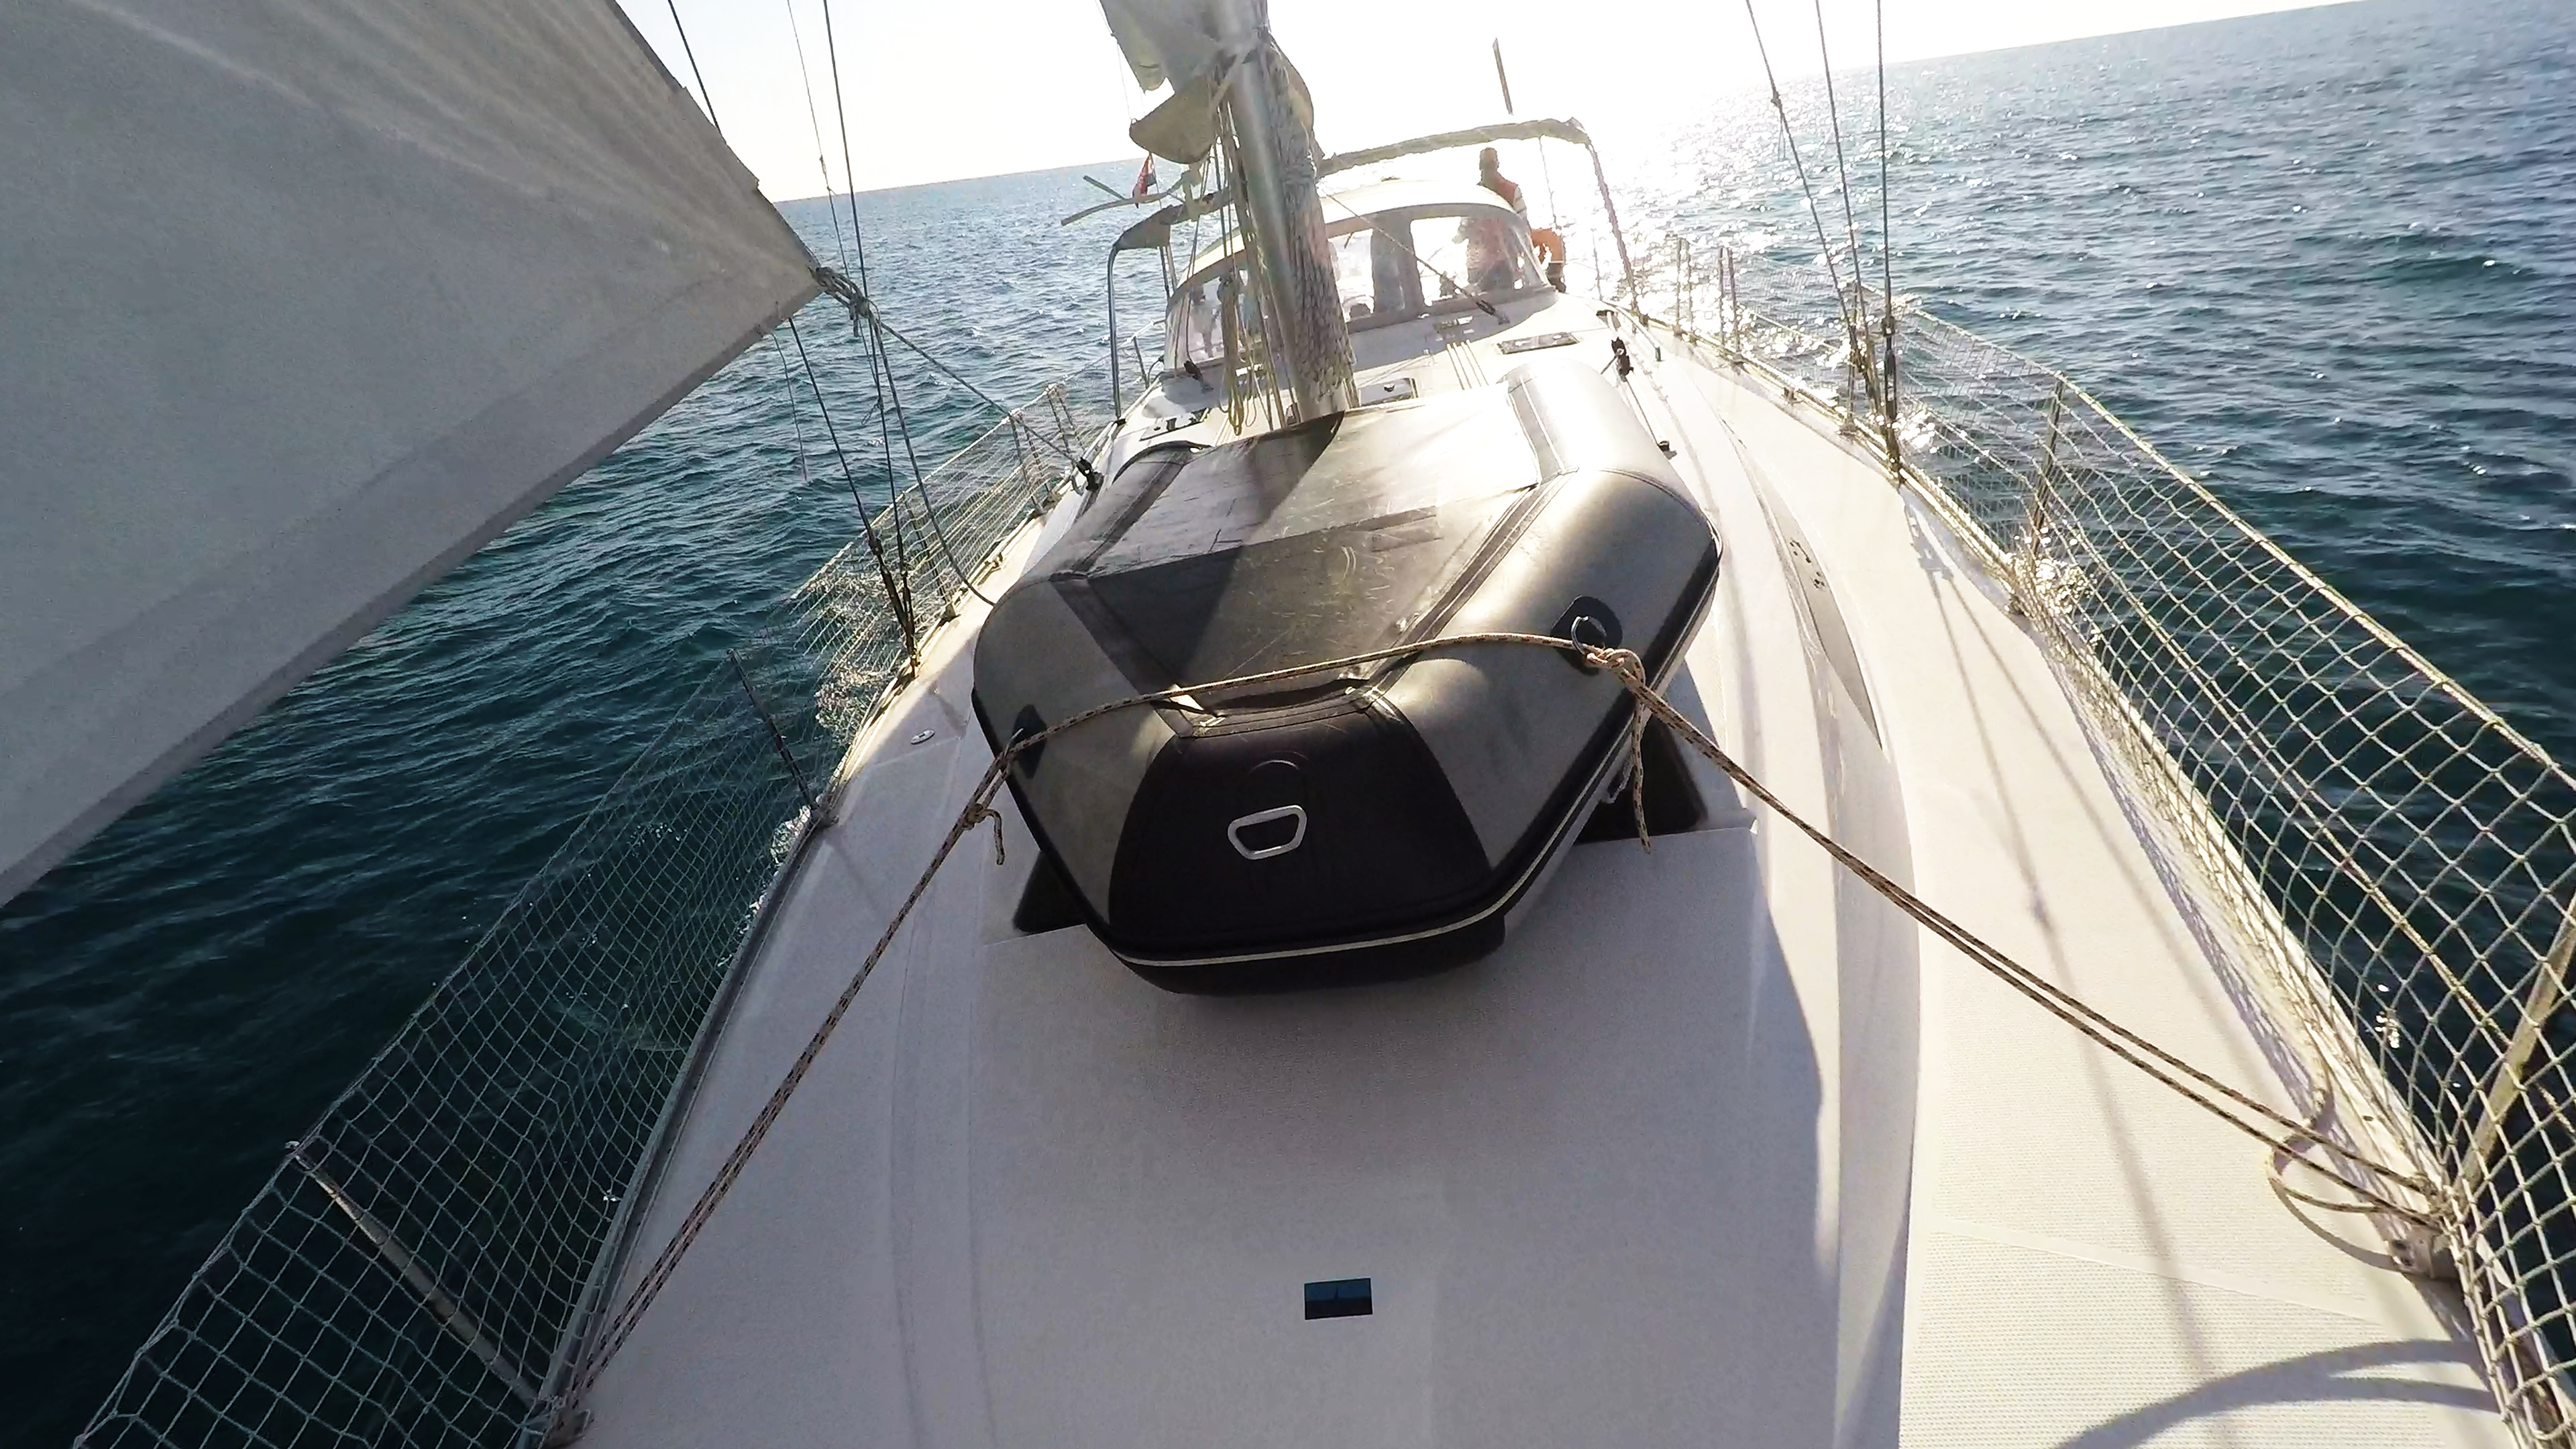 barcha a vela gommone al ponte yacht a vela bavaria 46 rete di sicurezza